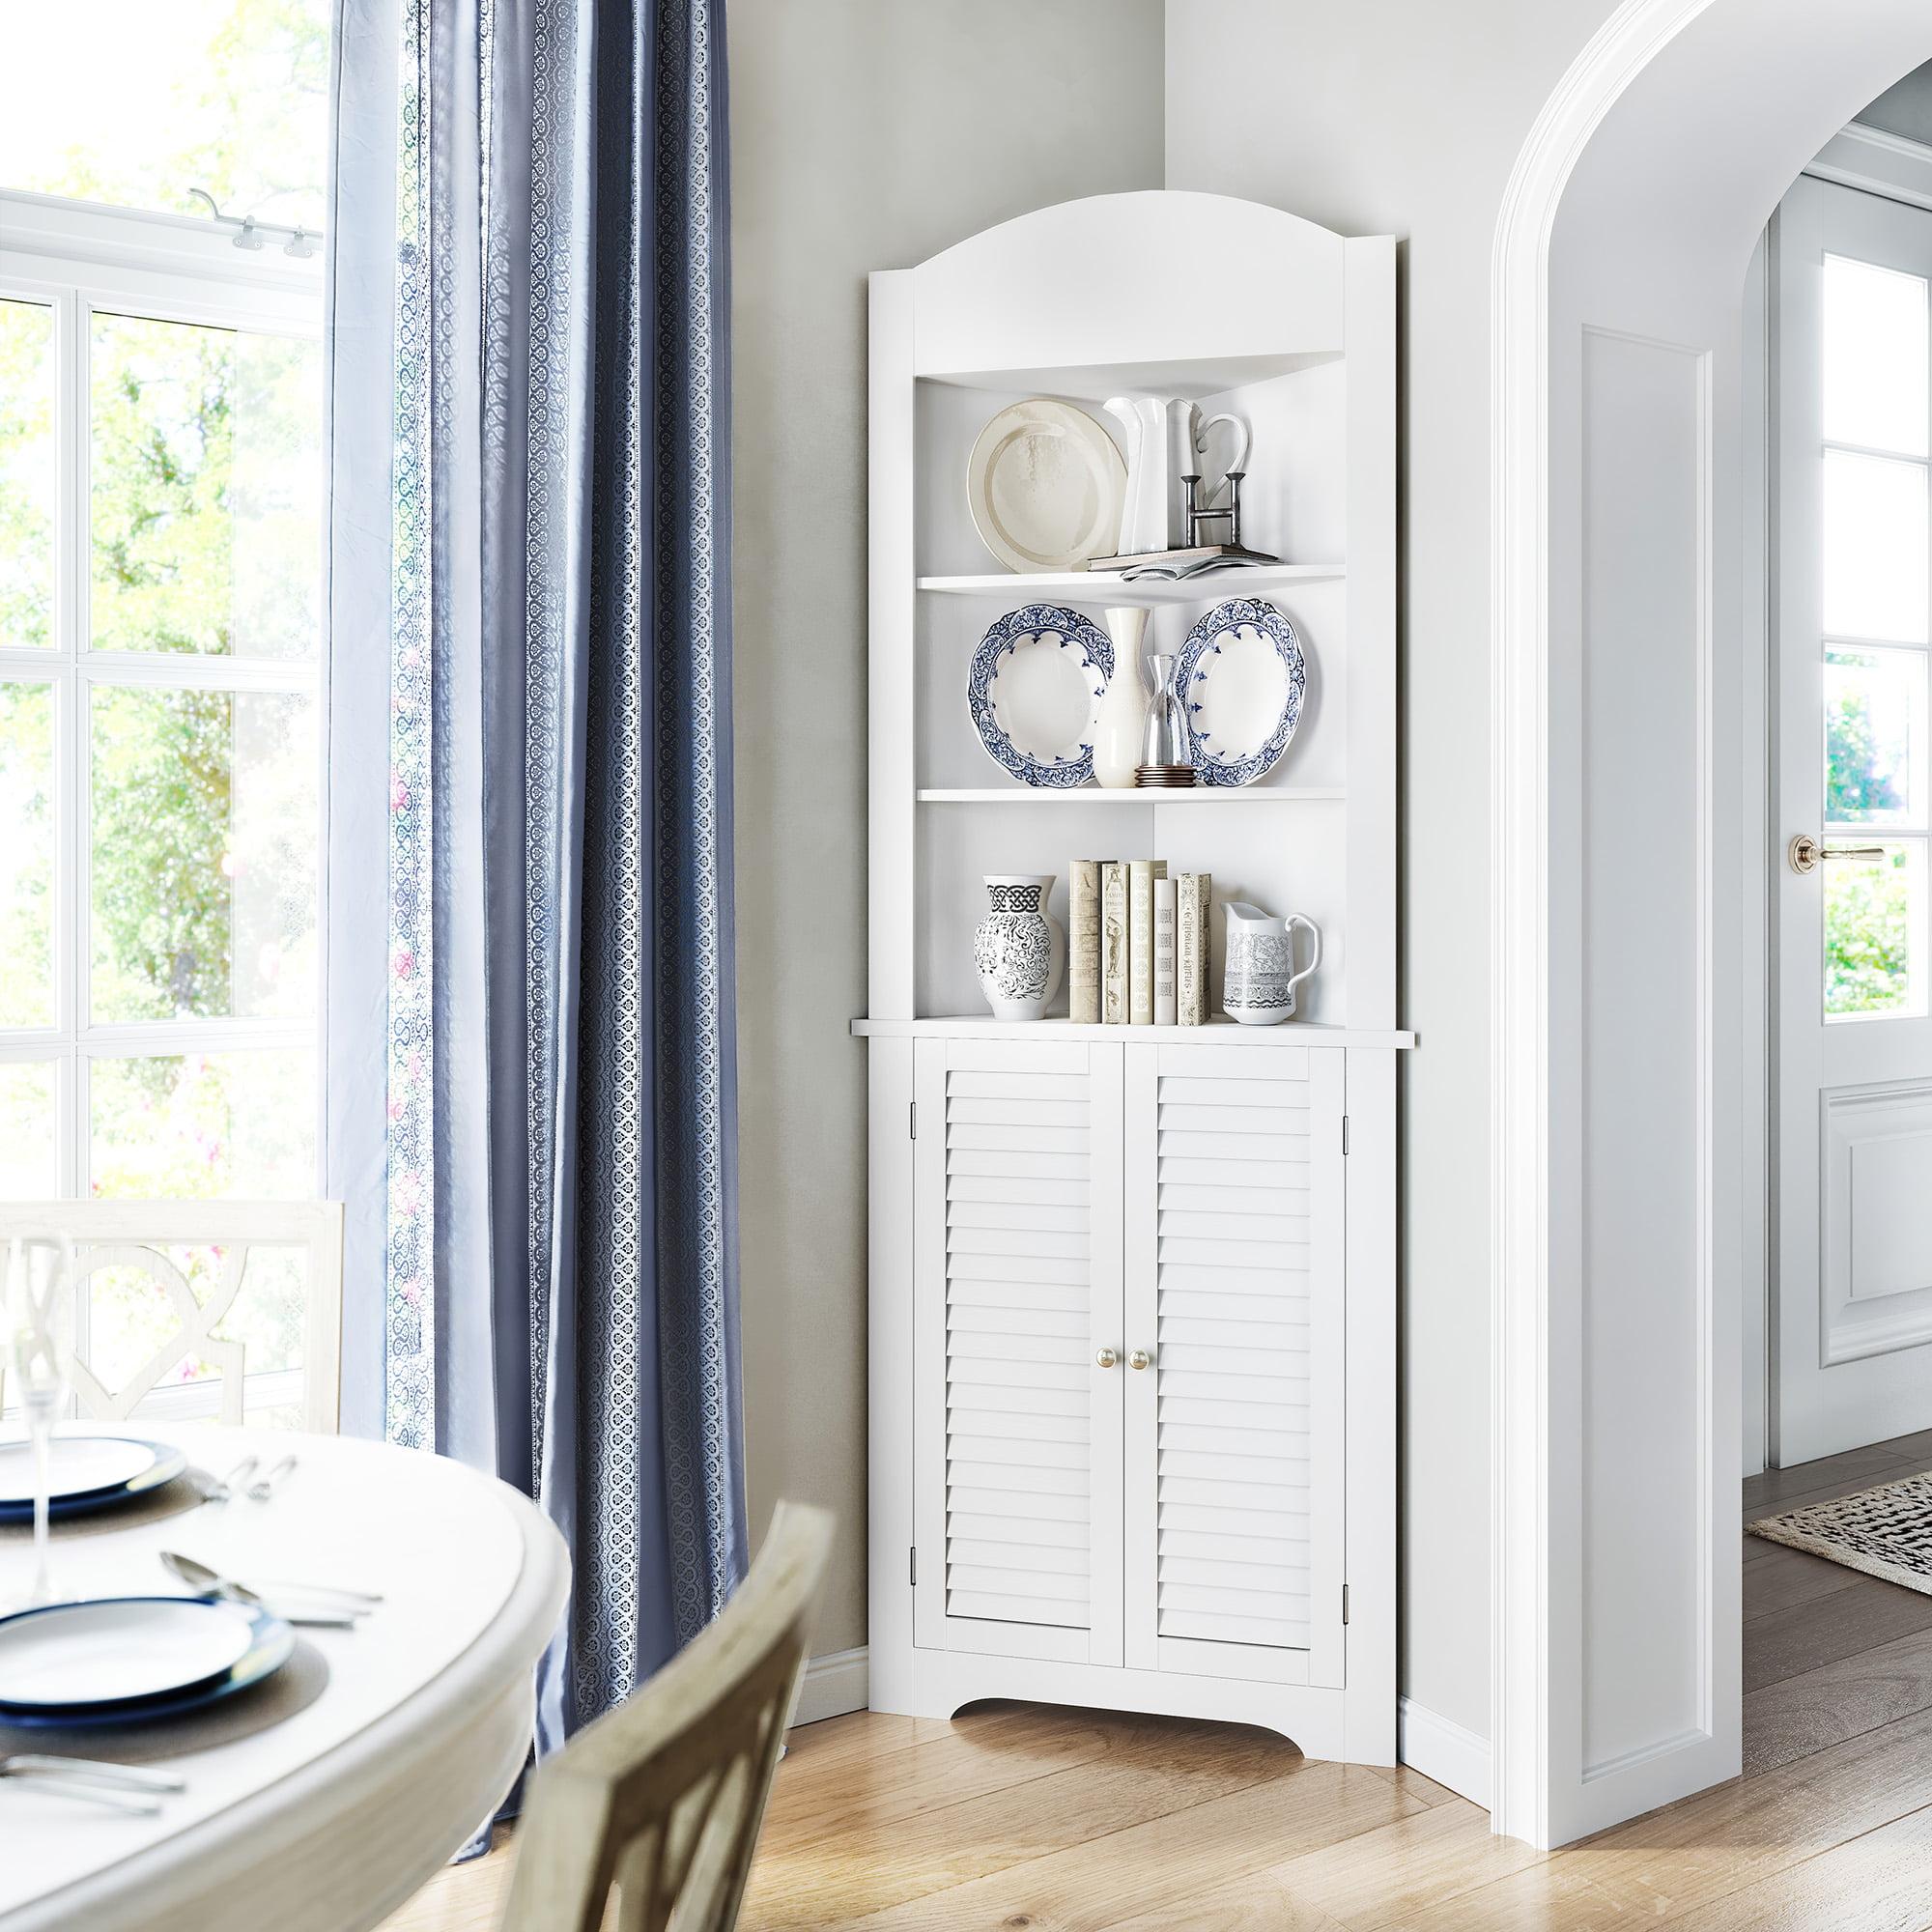 Corner Cabinet Small Bathroom Shelves Storage Organizer ...